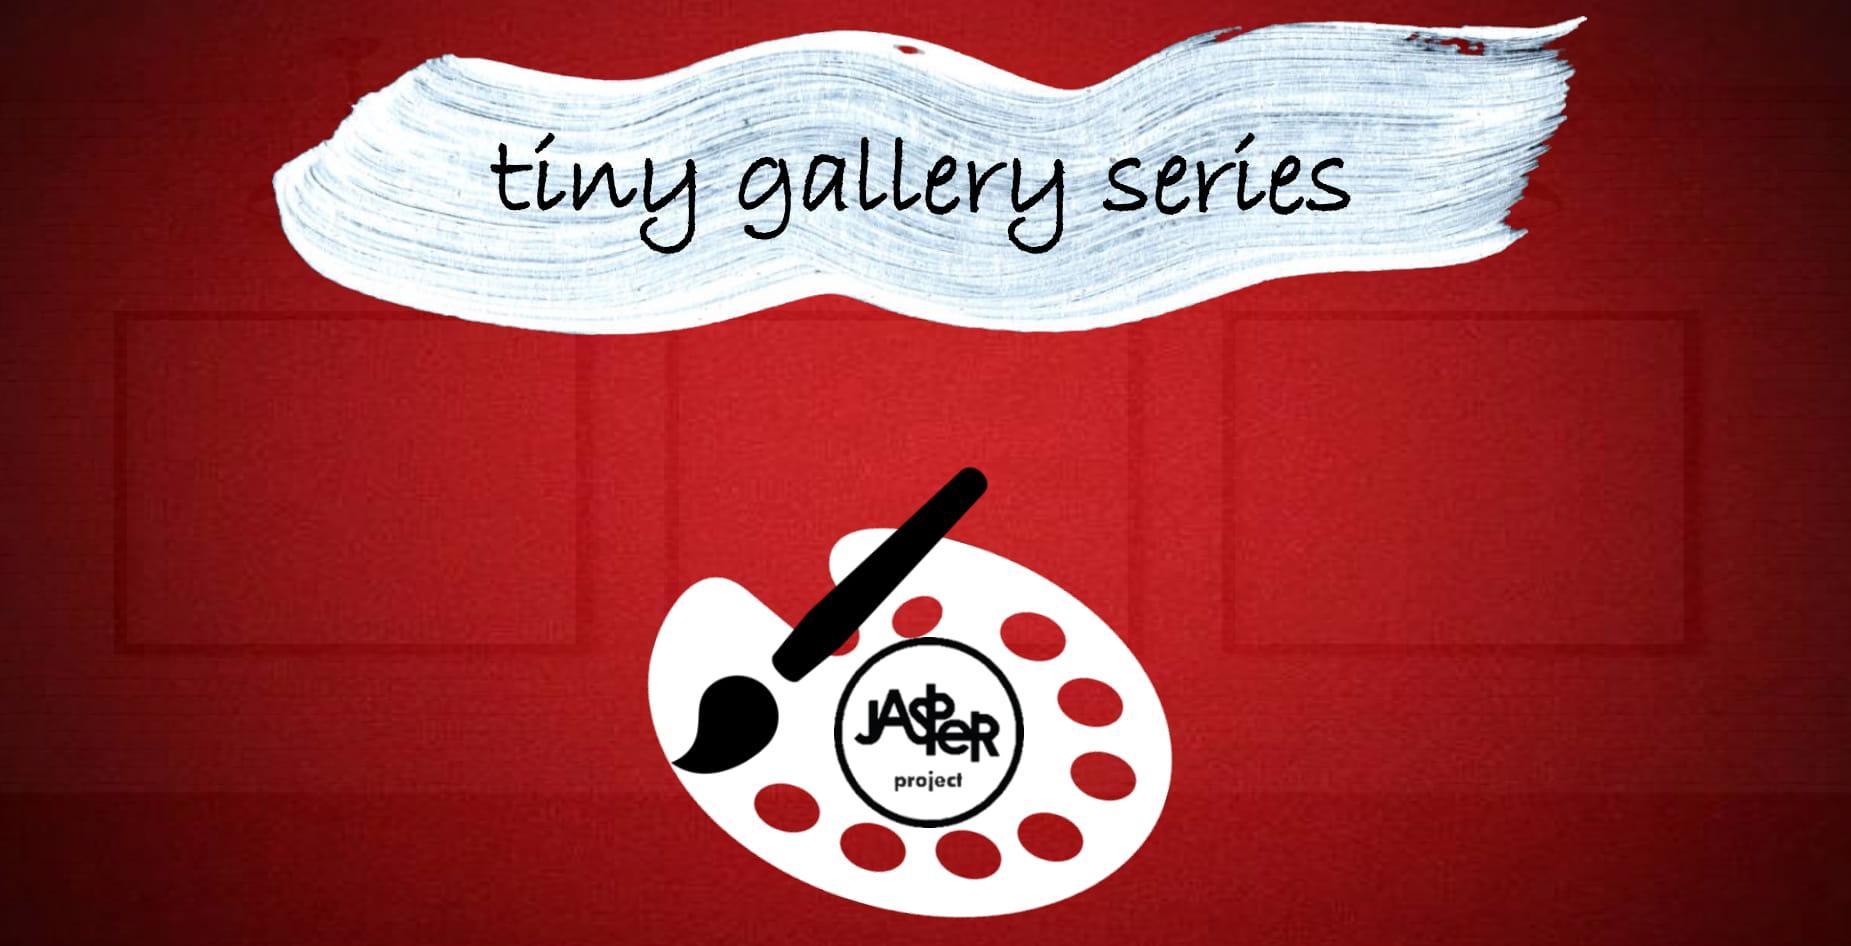 Tiny Gallery Series Graphic 2 JPG.jpg